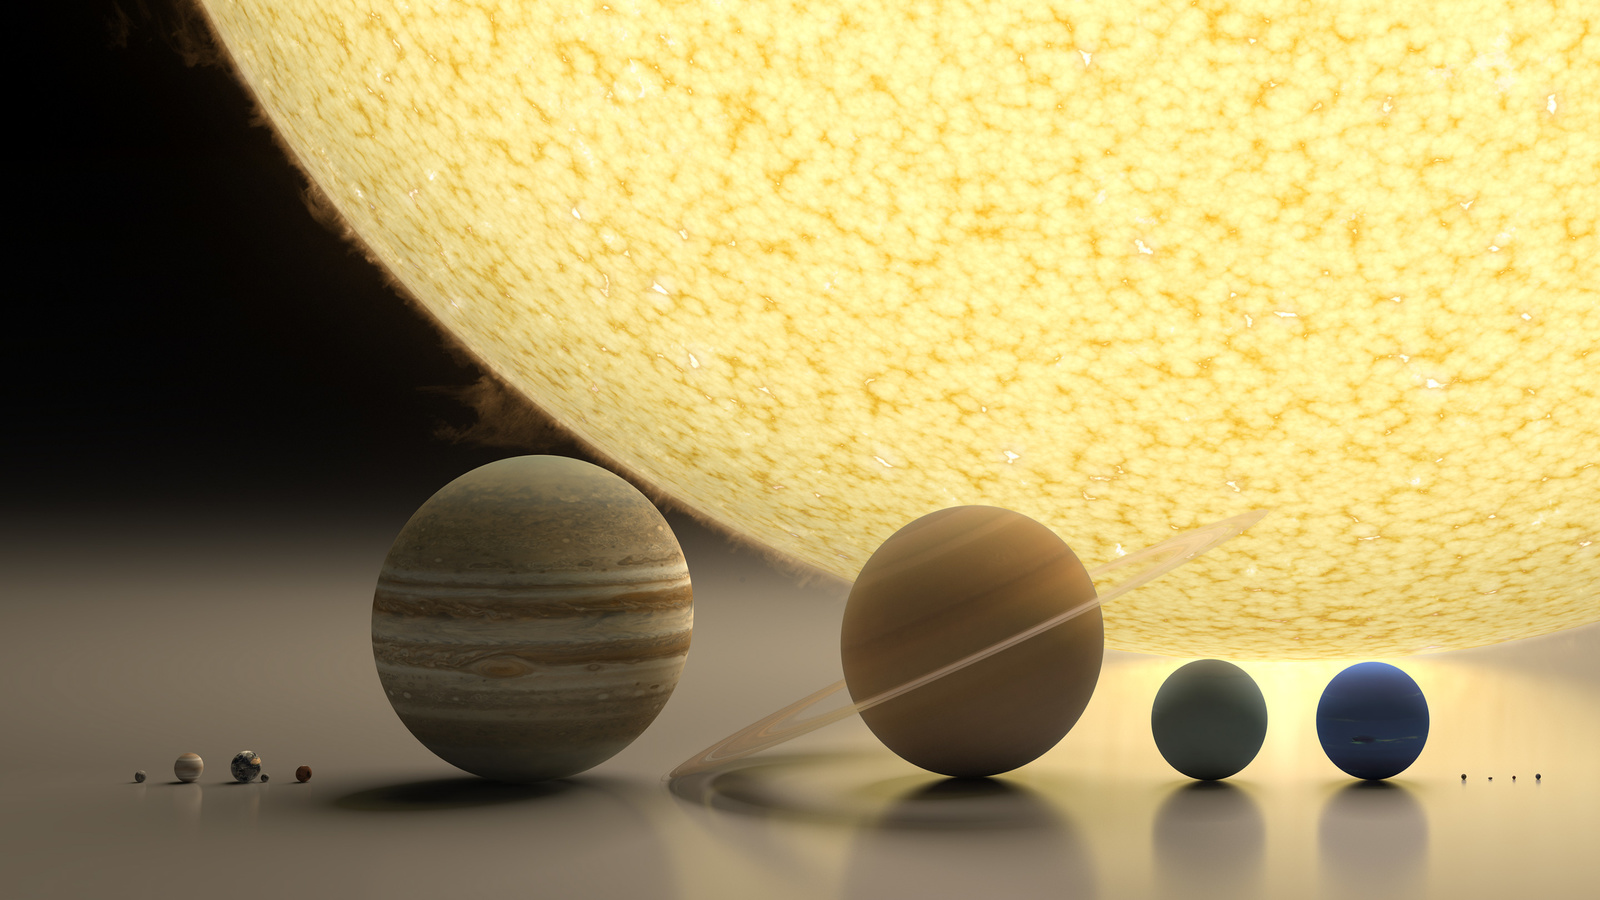 макеты, планеты, 3d